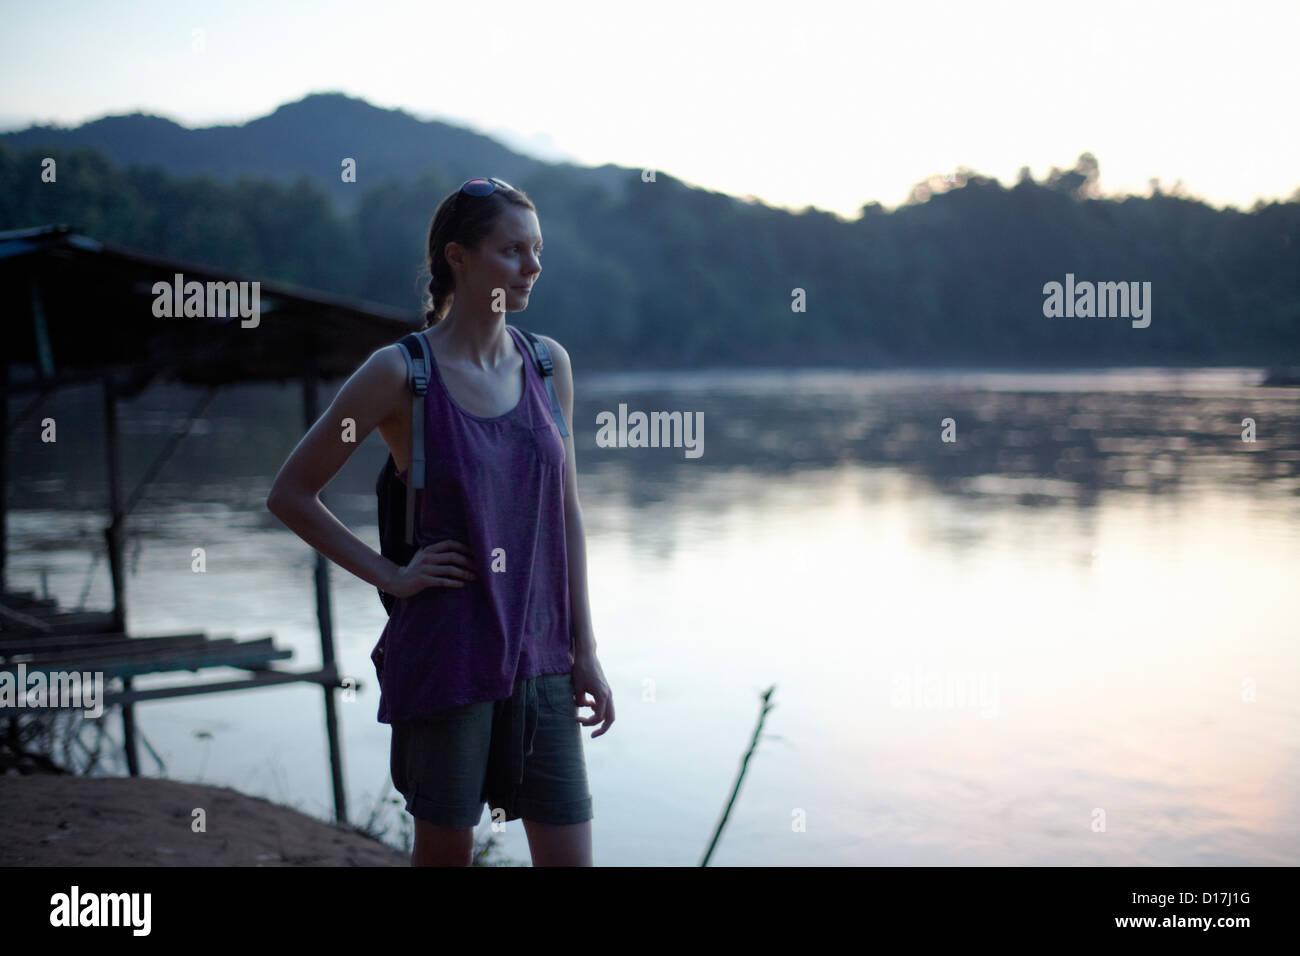 Woman walking by still lake - Stock Image